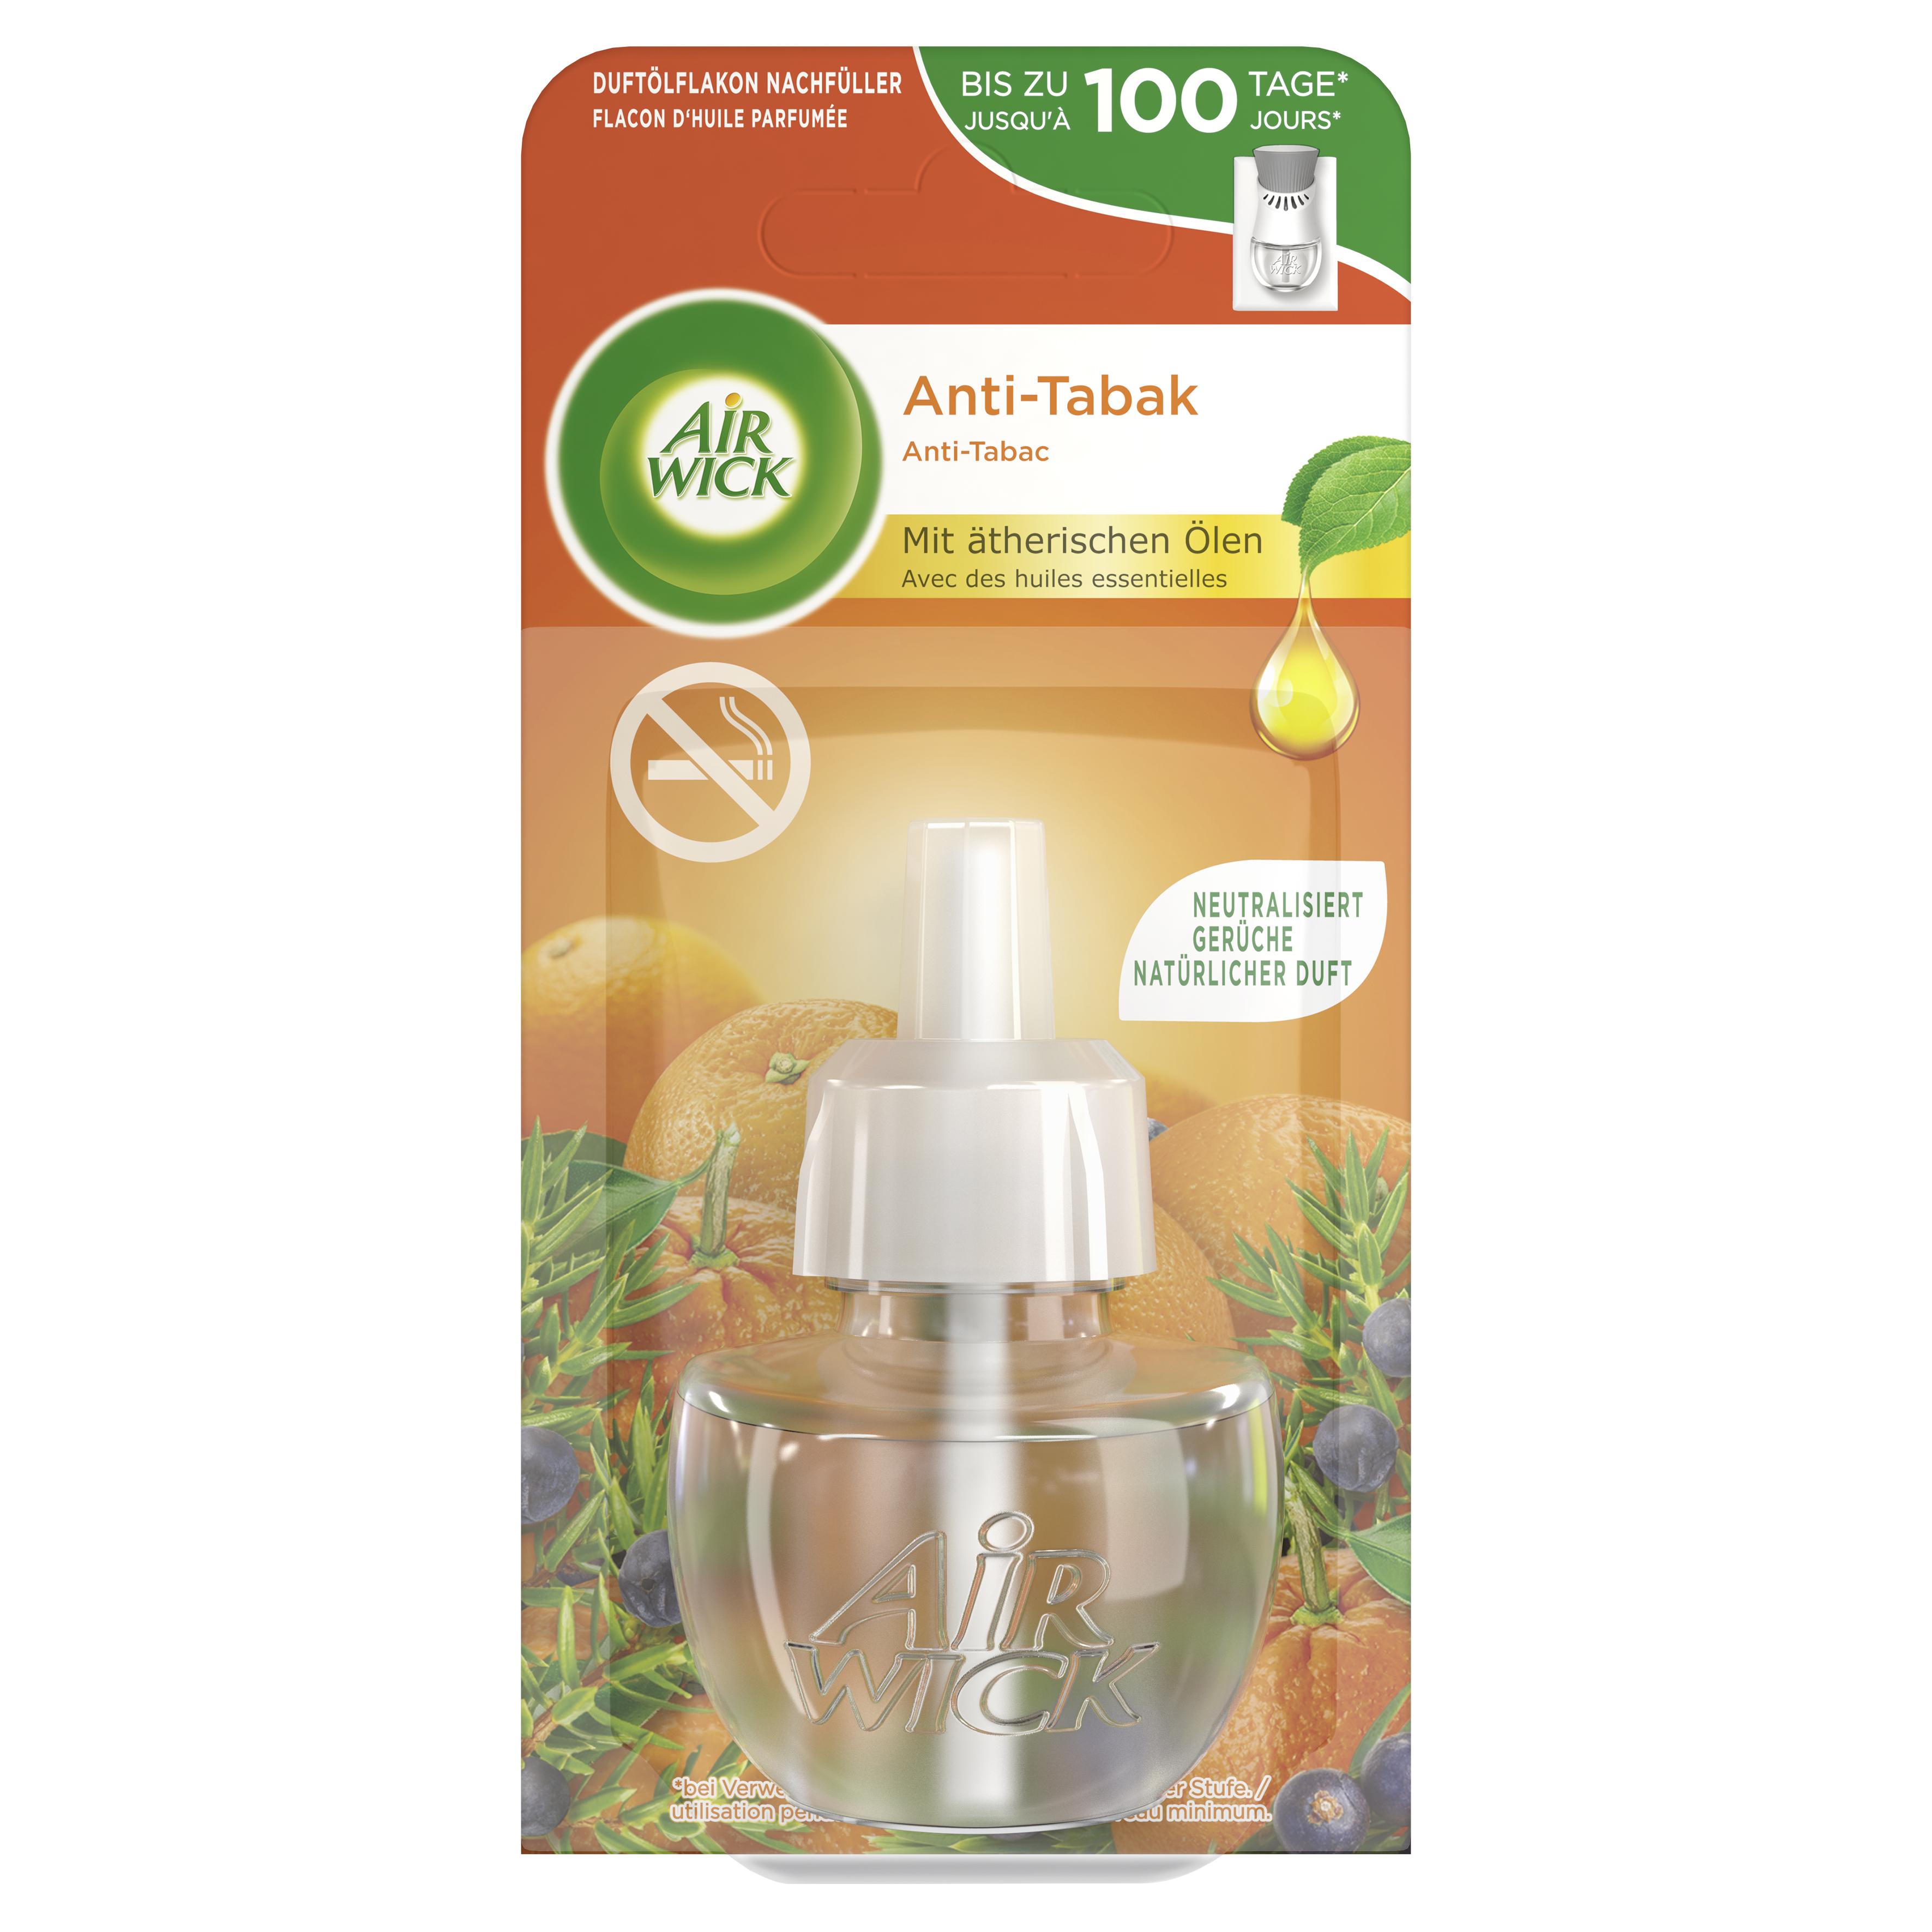 Air Wick Duftölflakon Nachfüller Anti-Tabak